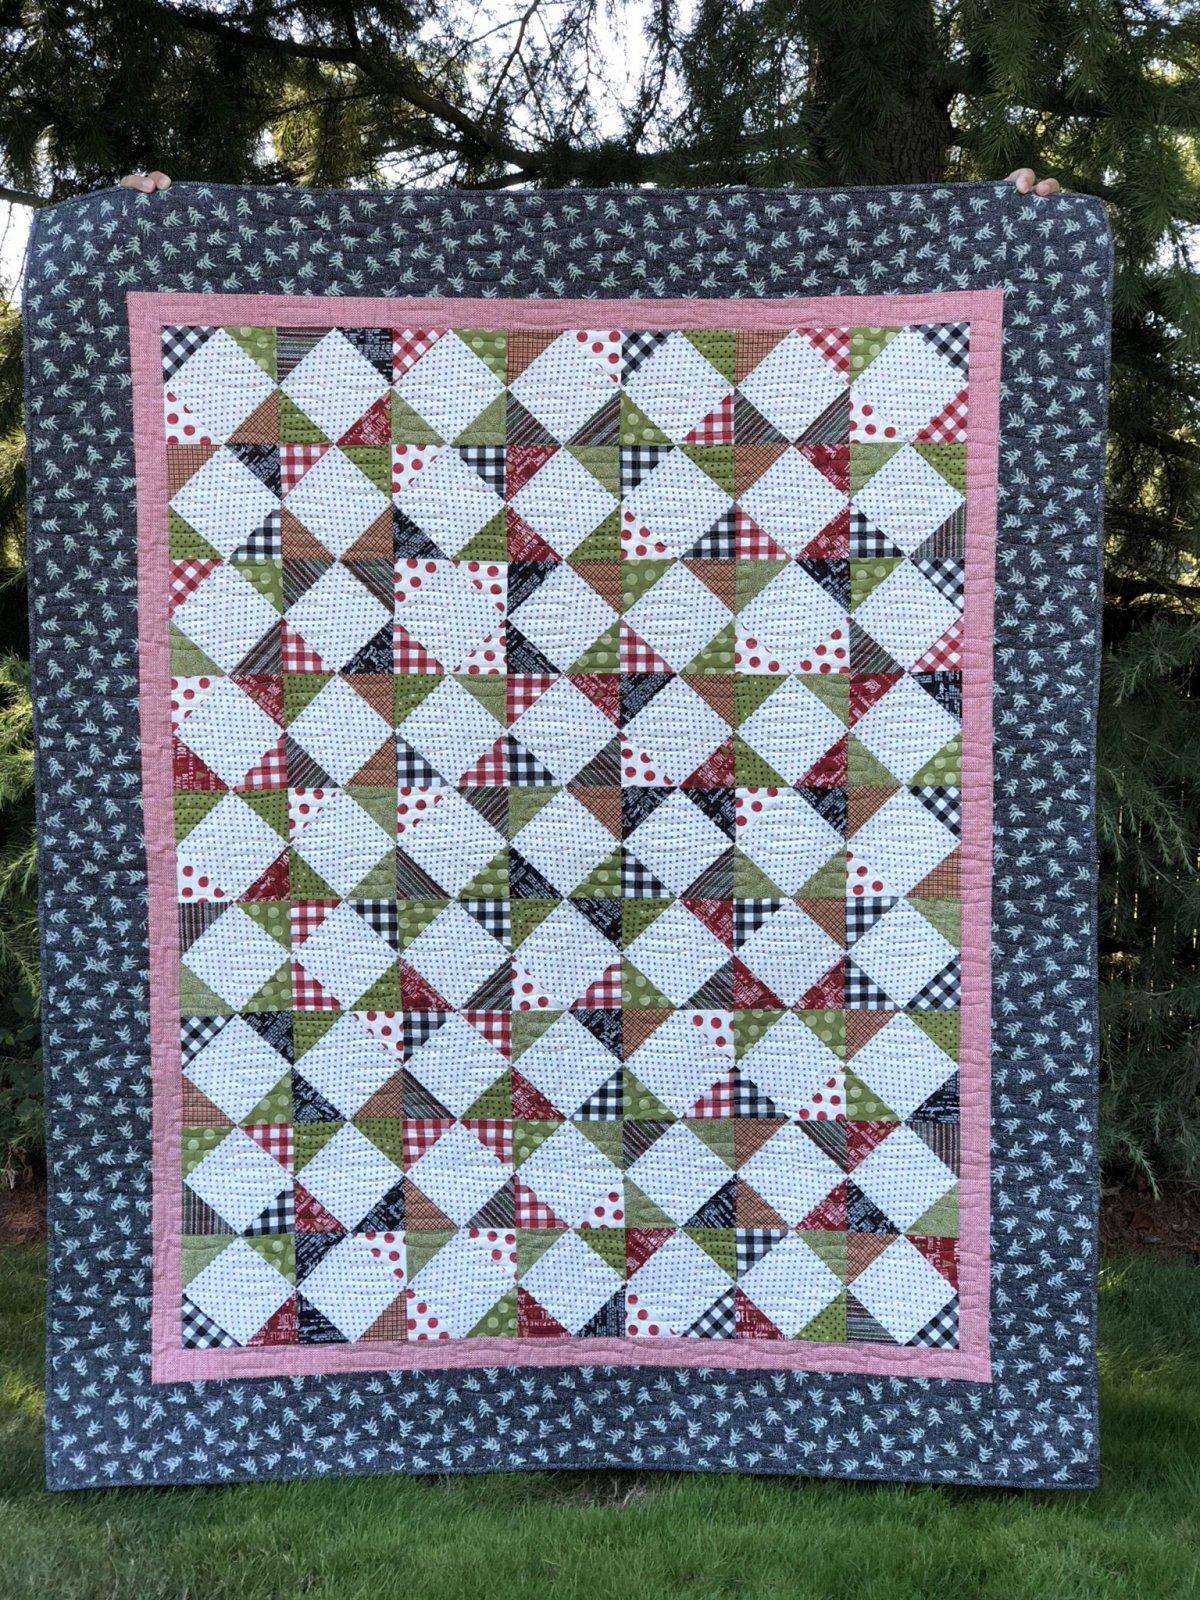 Grandma's Picnic Quilt Kit